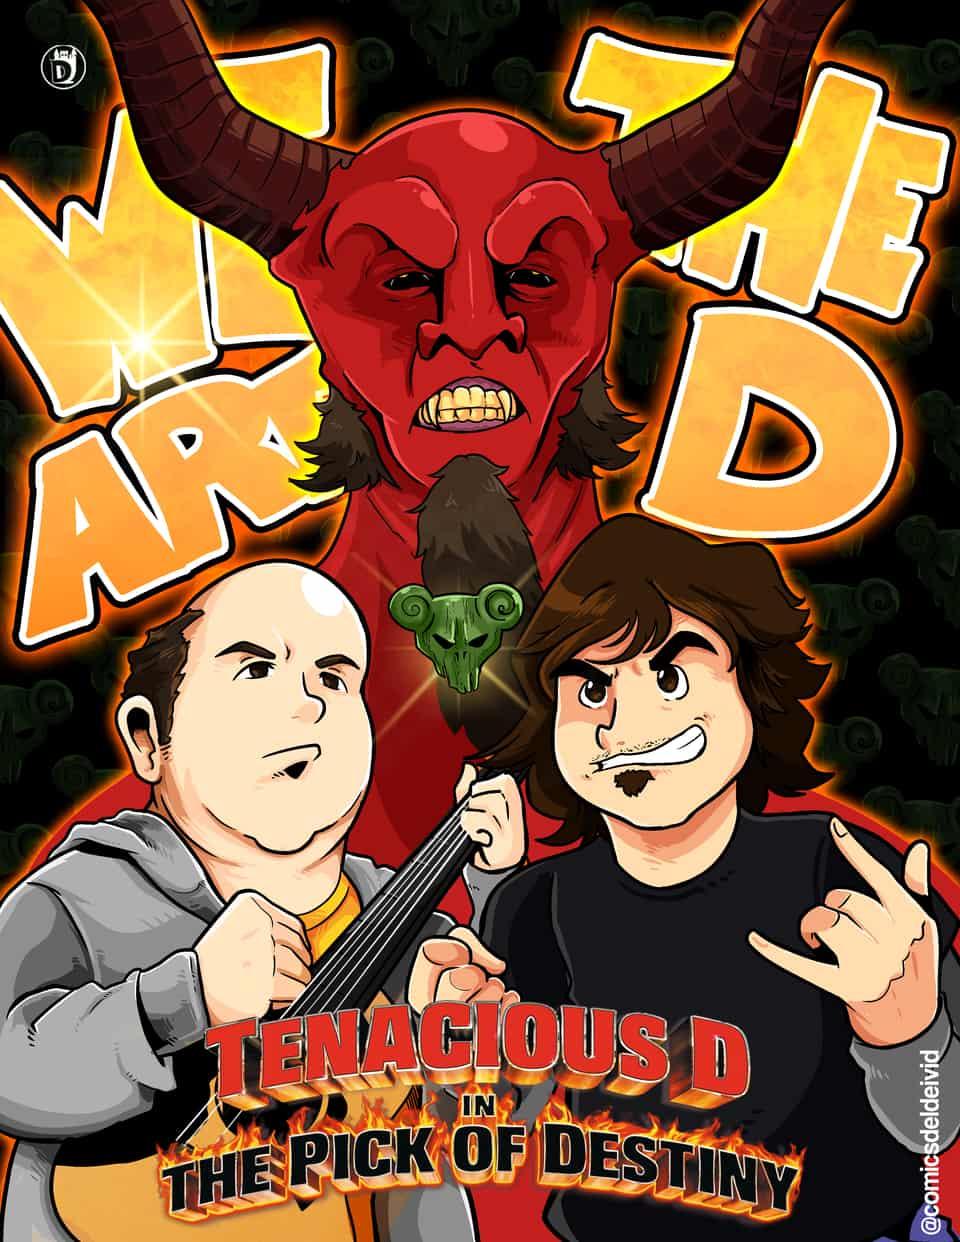 Tenacious D Poster Illust of DCastlee tenaciousD devil kylegass tenacious destiny jackblack